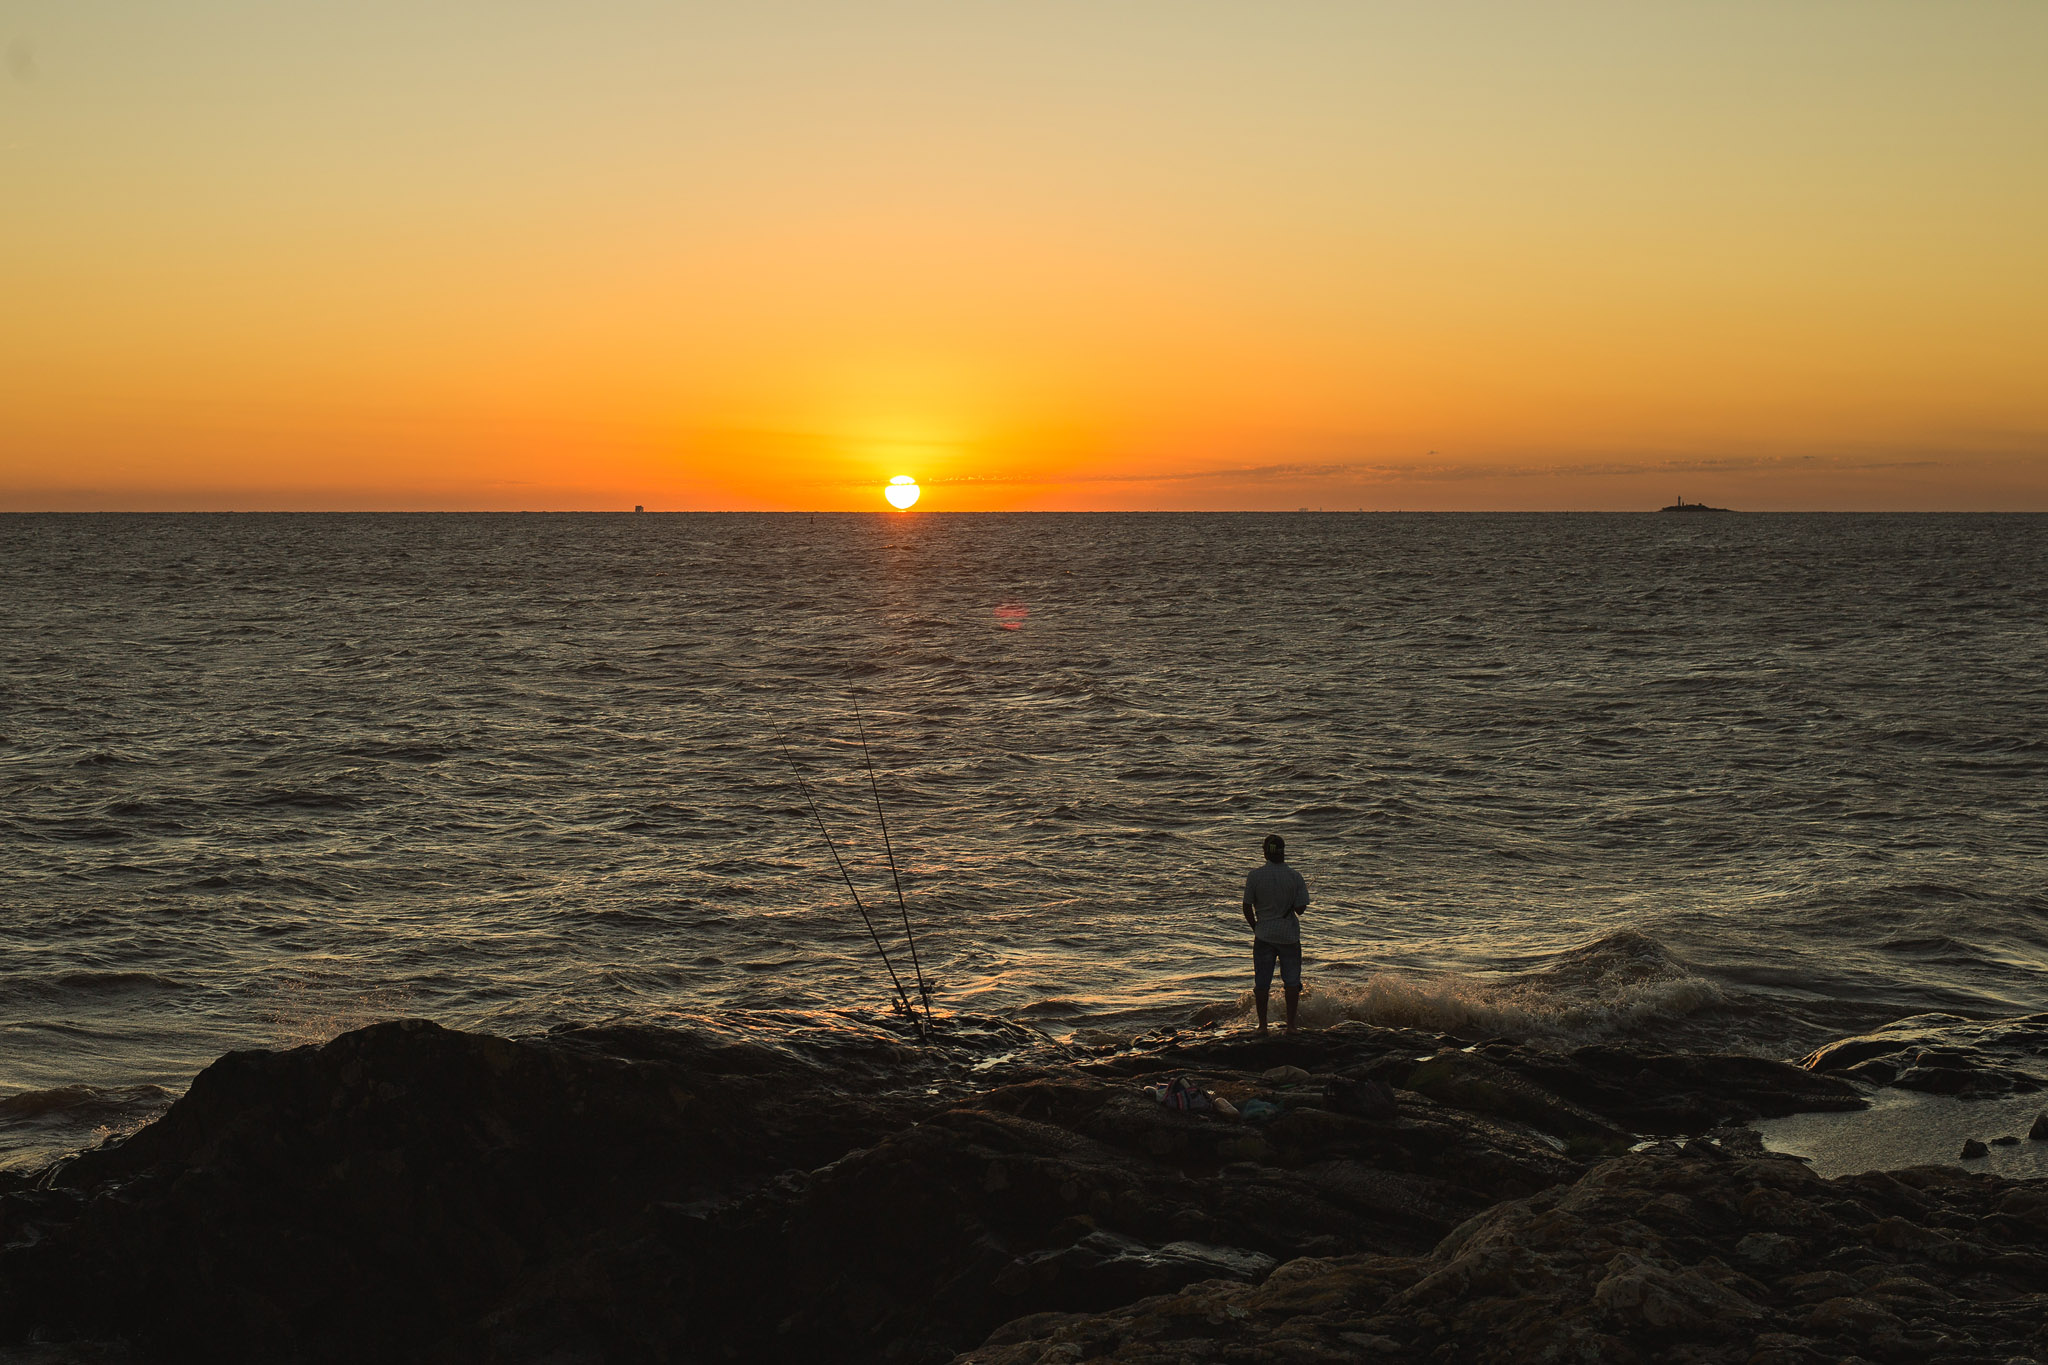 wedding-travellers-destination-photography-overlanding-south-america-uruguay-colonia-del-sacramento-sunset-fisherman